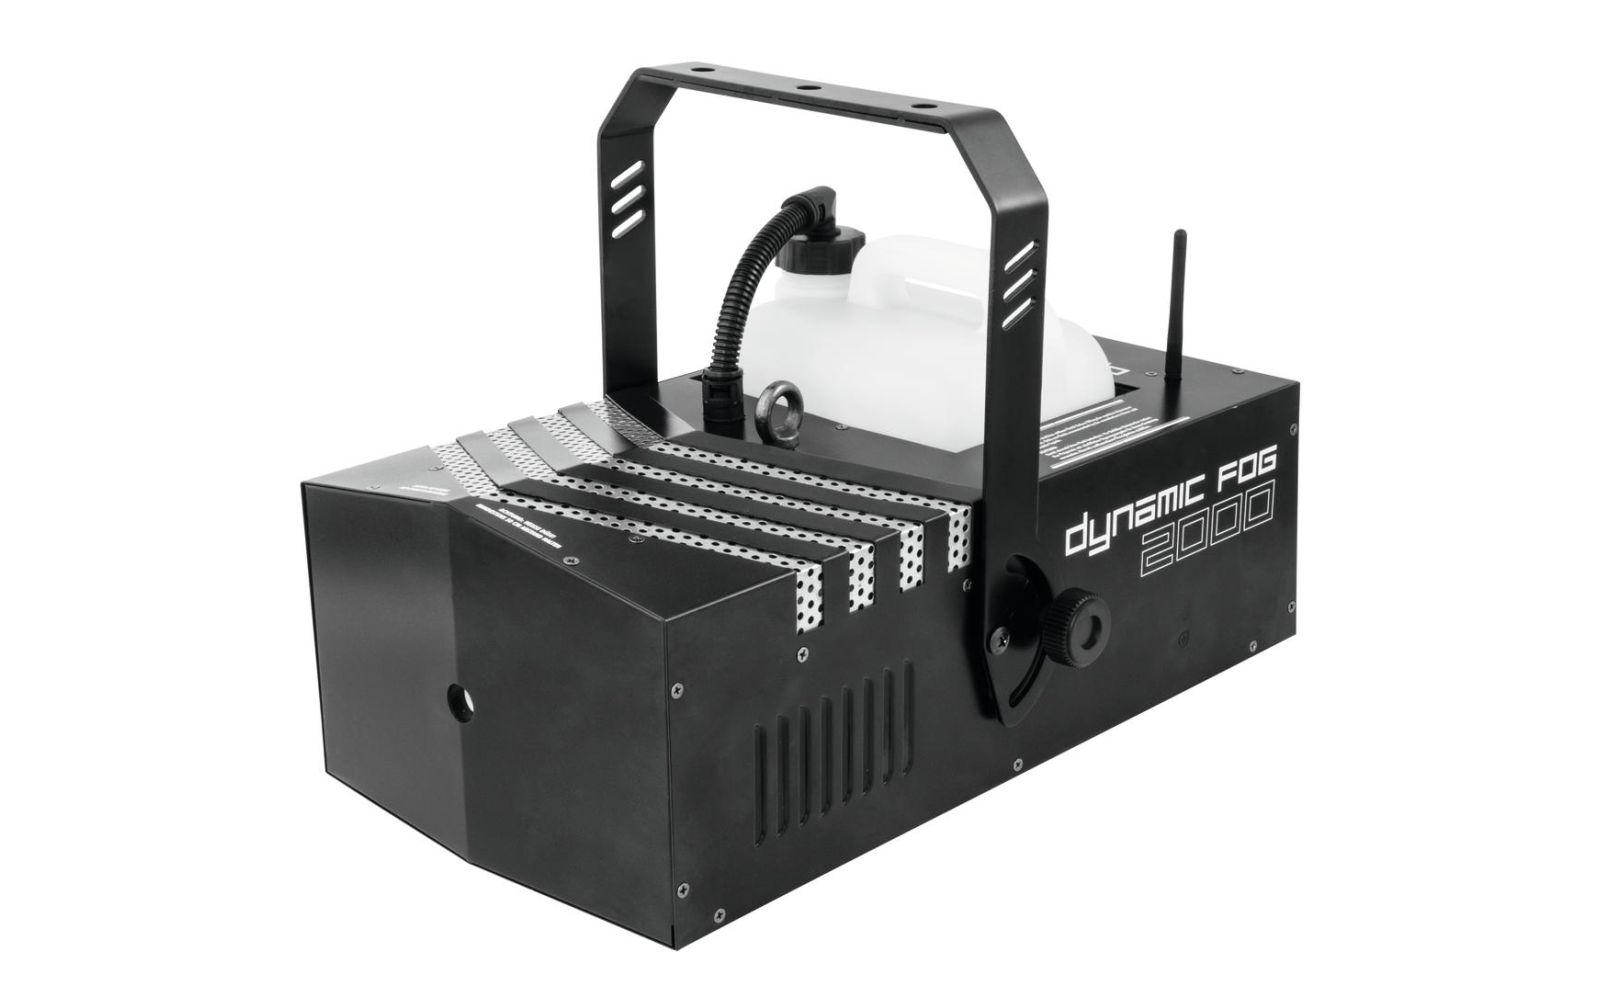 eurolite-dynamic-fog-2000-nebelmaschine